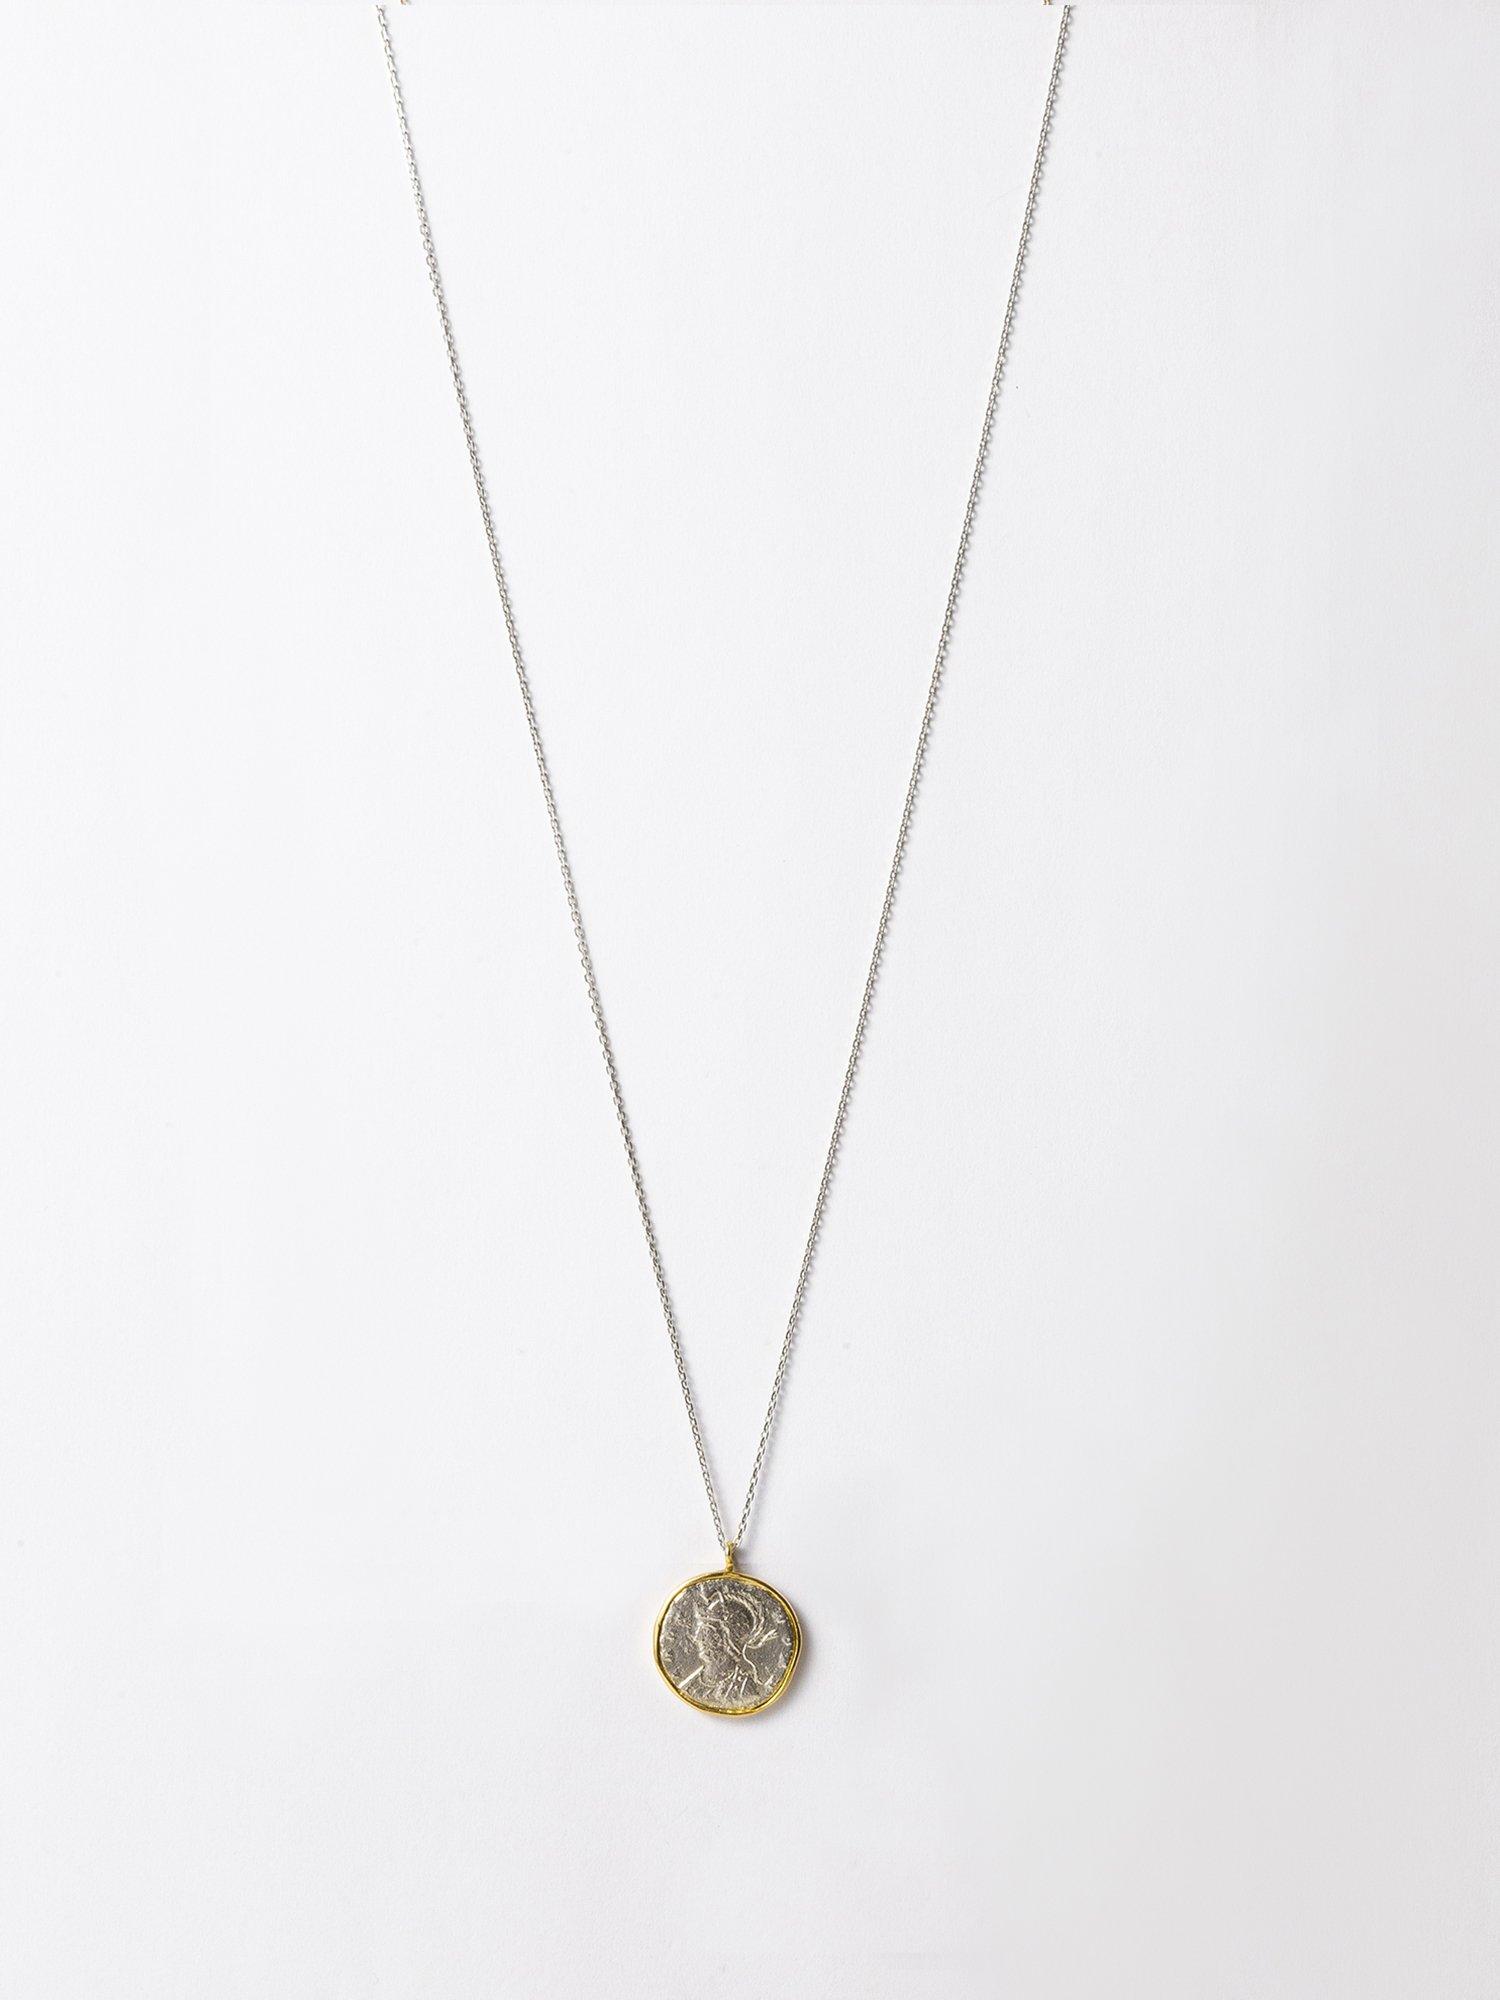 ARTEMIS / Roman coin necklace / Romulus and Remus